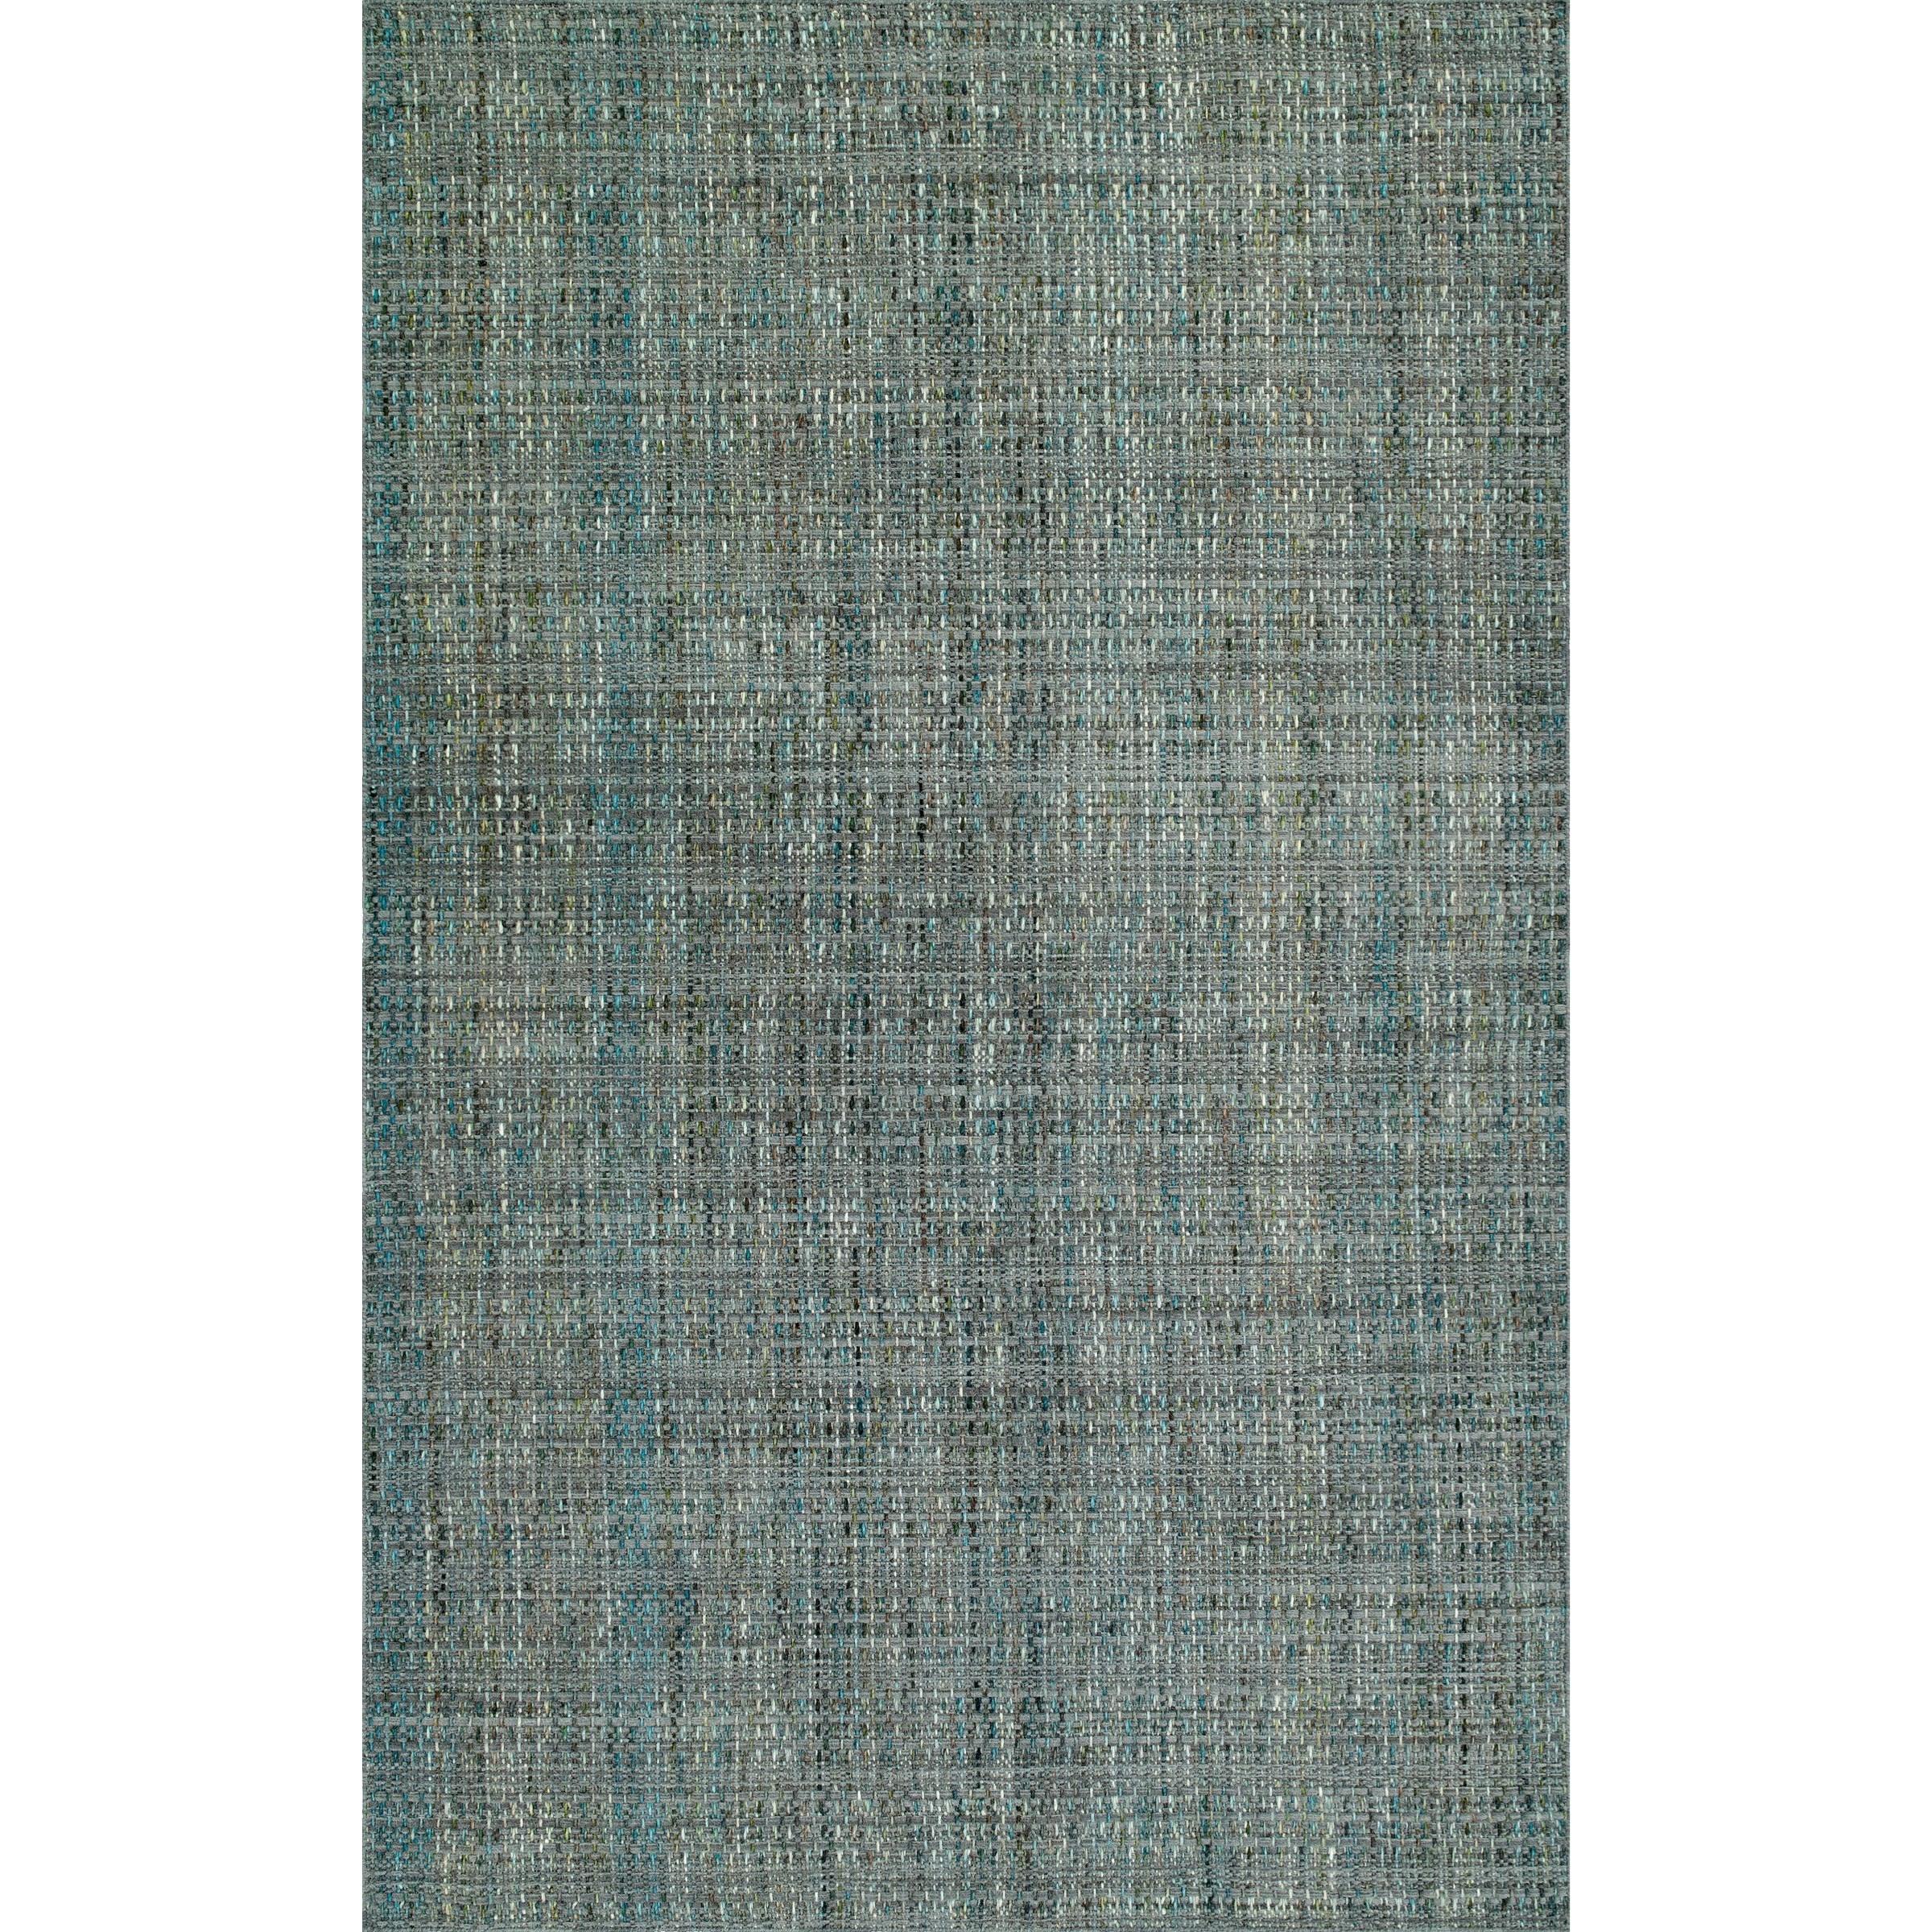 Nepal Grey 9' x 13' Rug by Dalyn at Arwood's Furniture